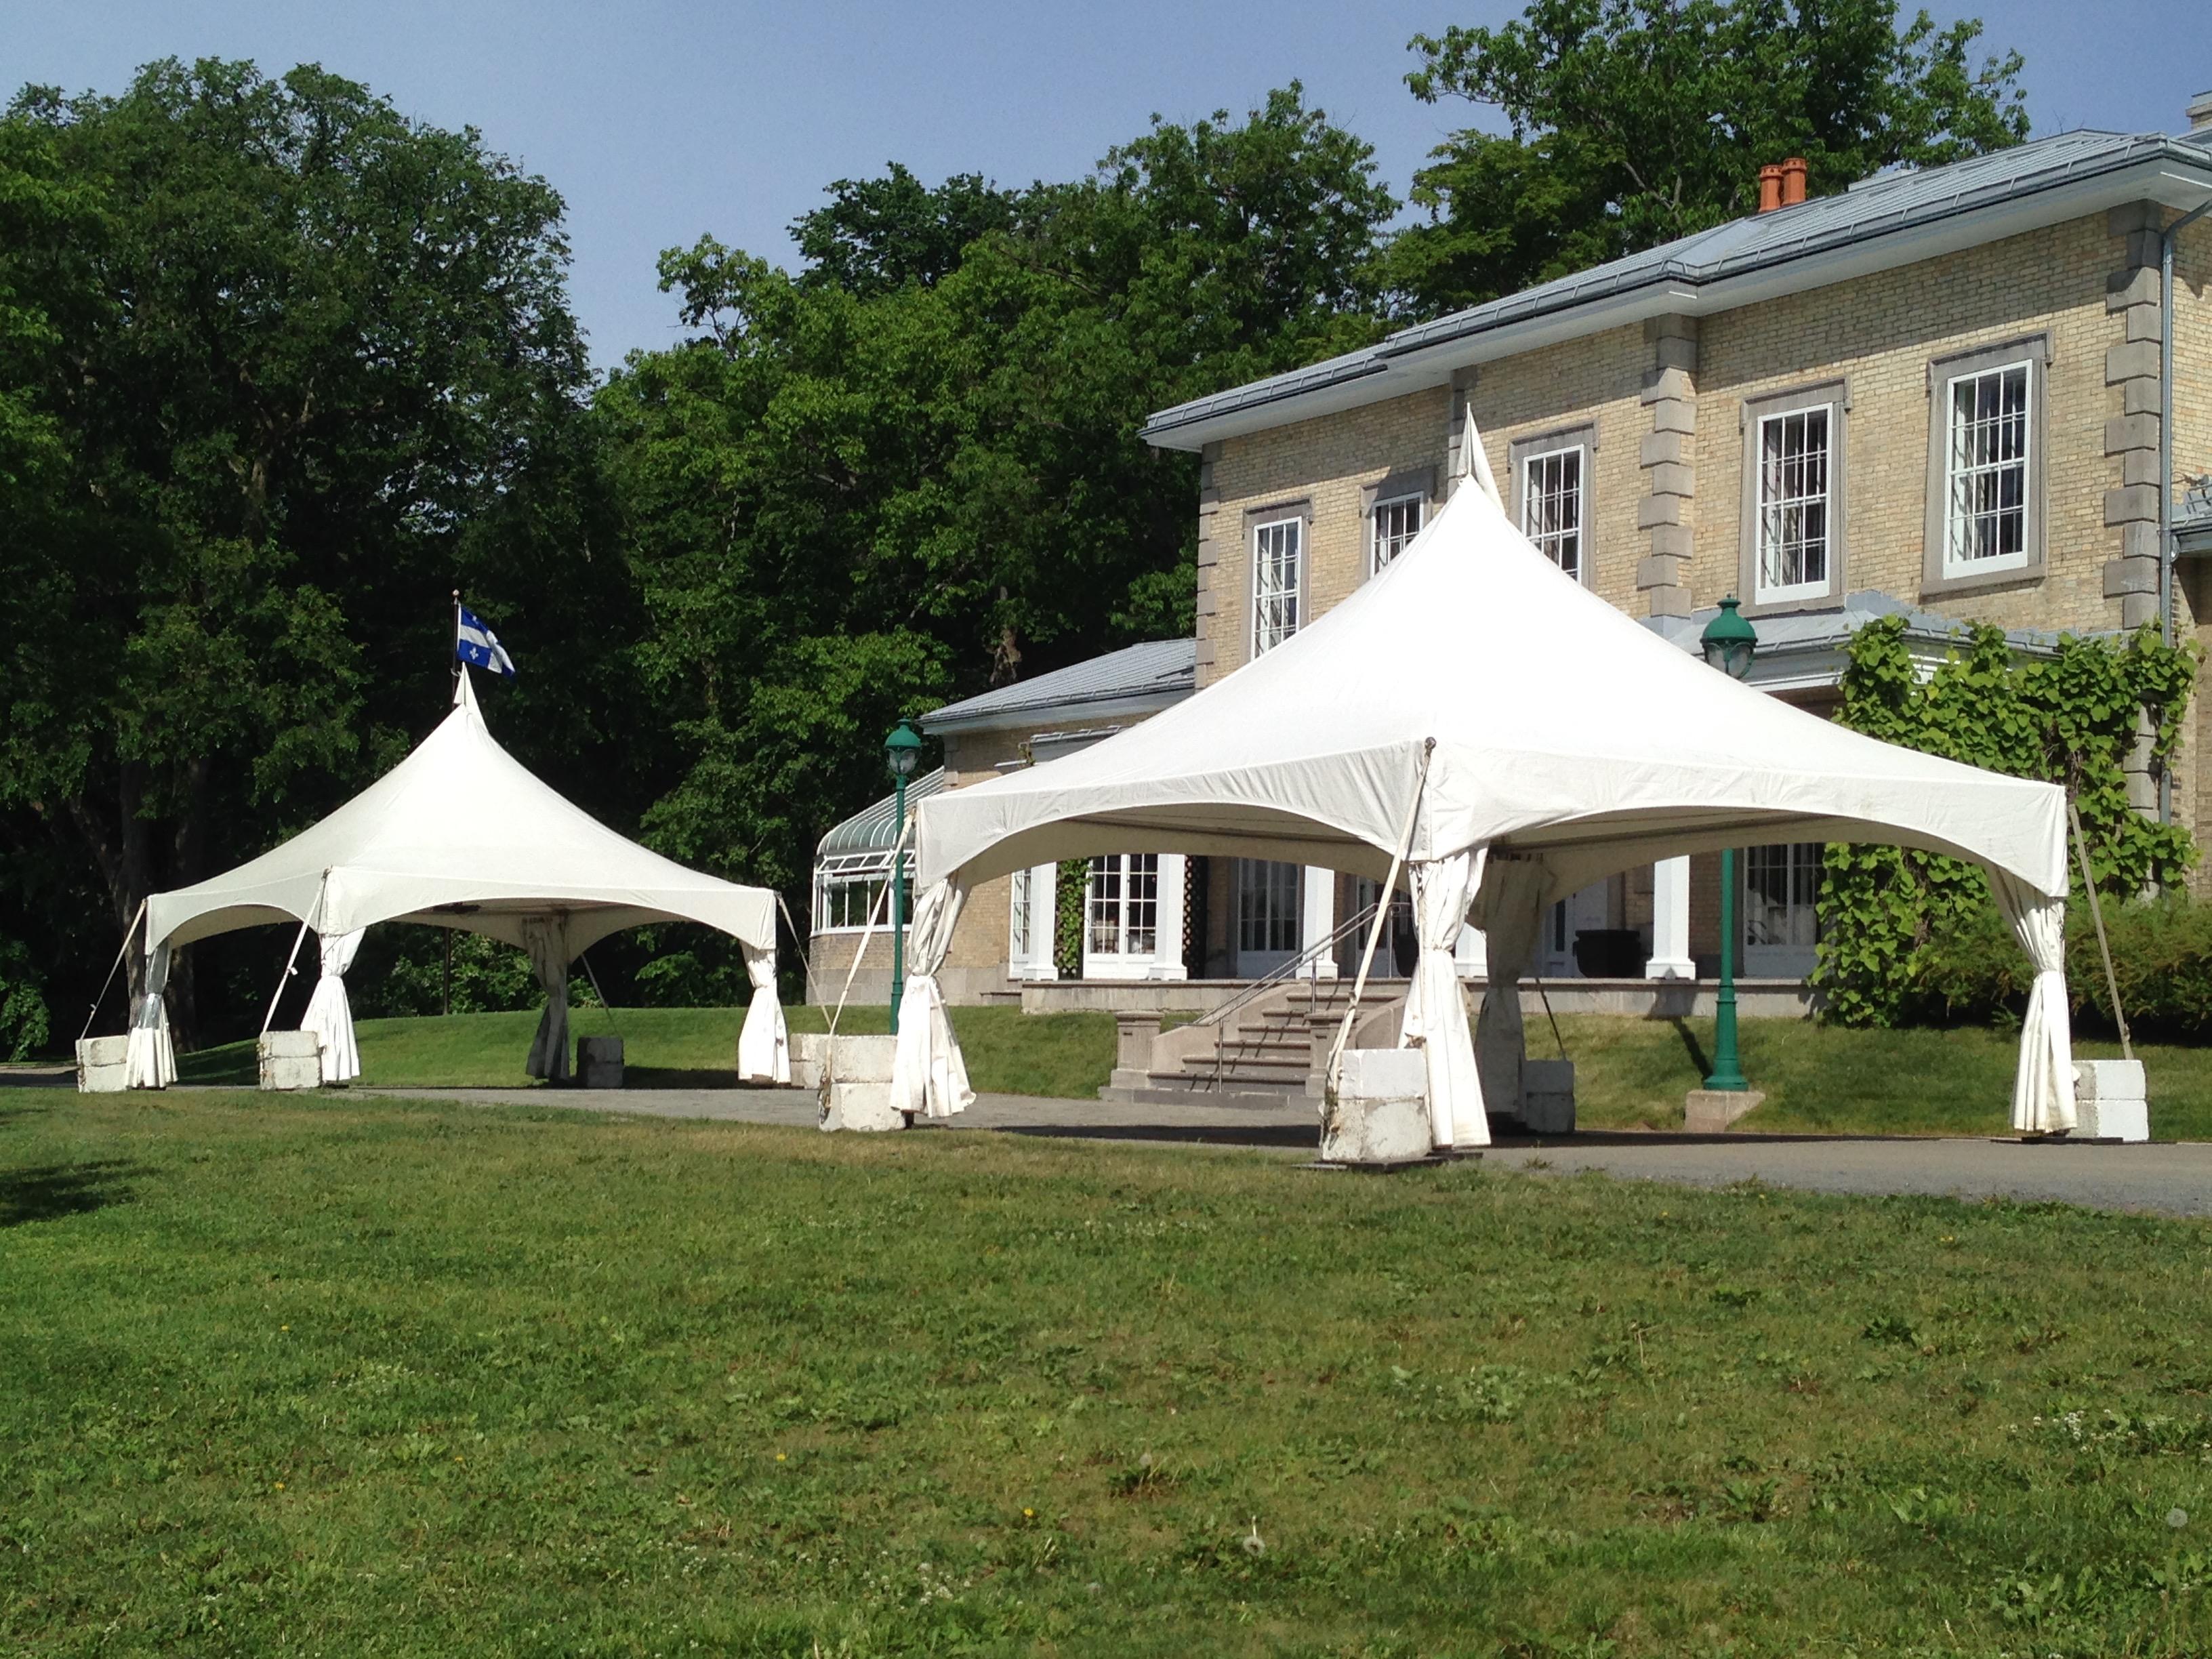 Tente – Chapiteaux du Monde